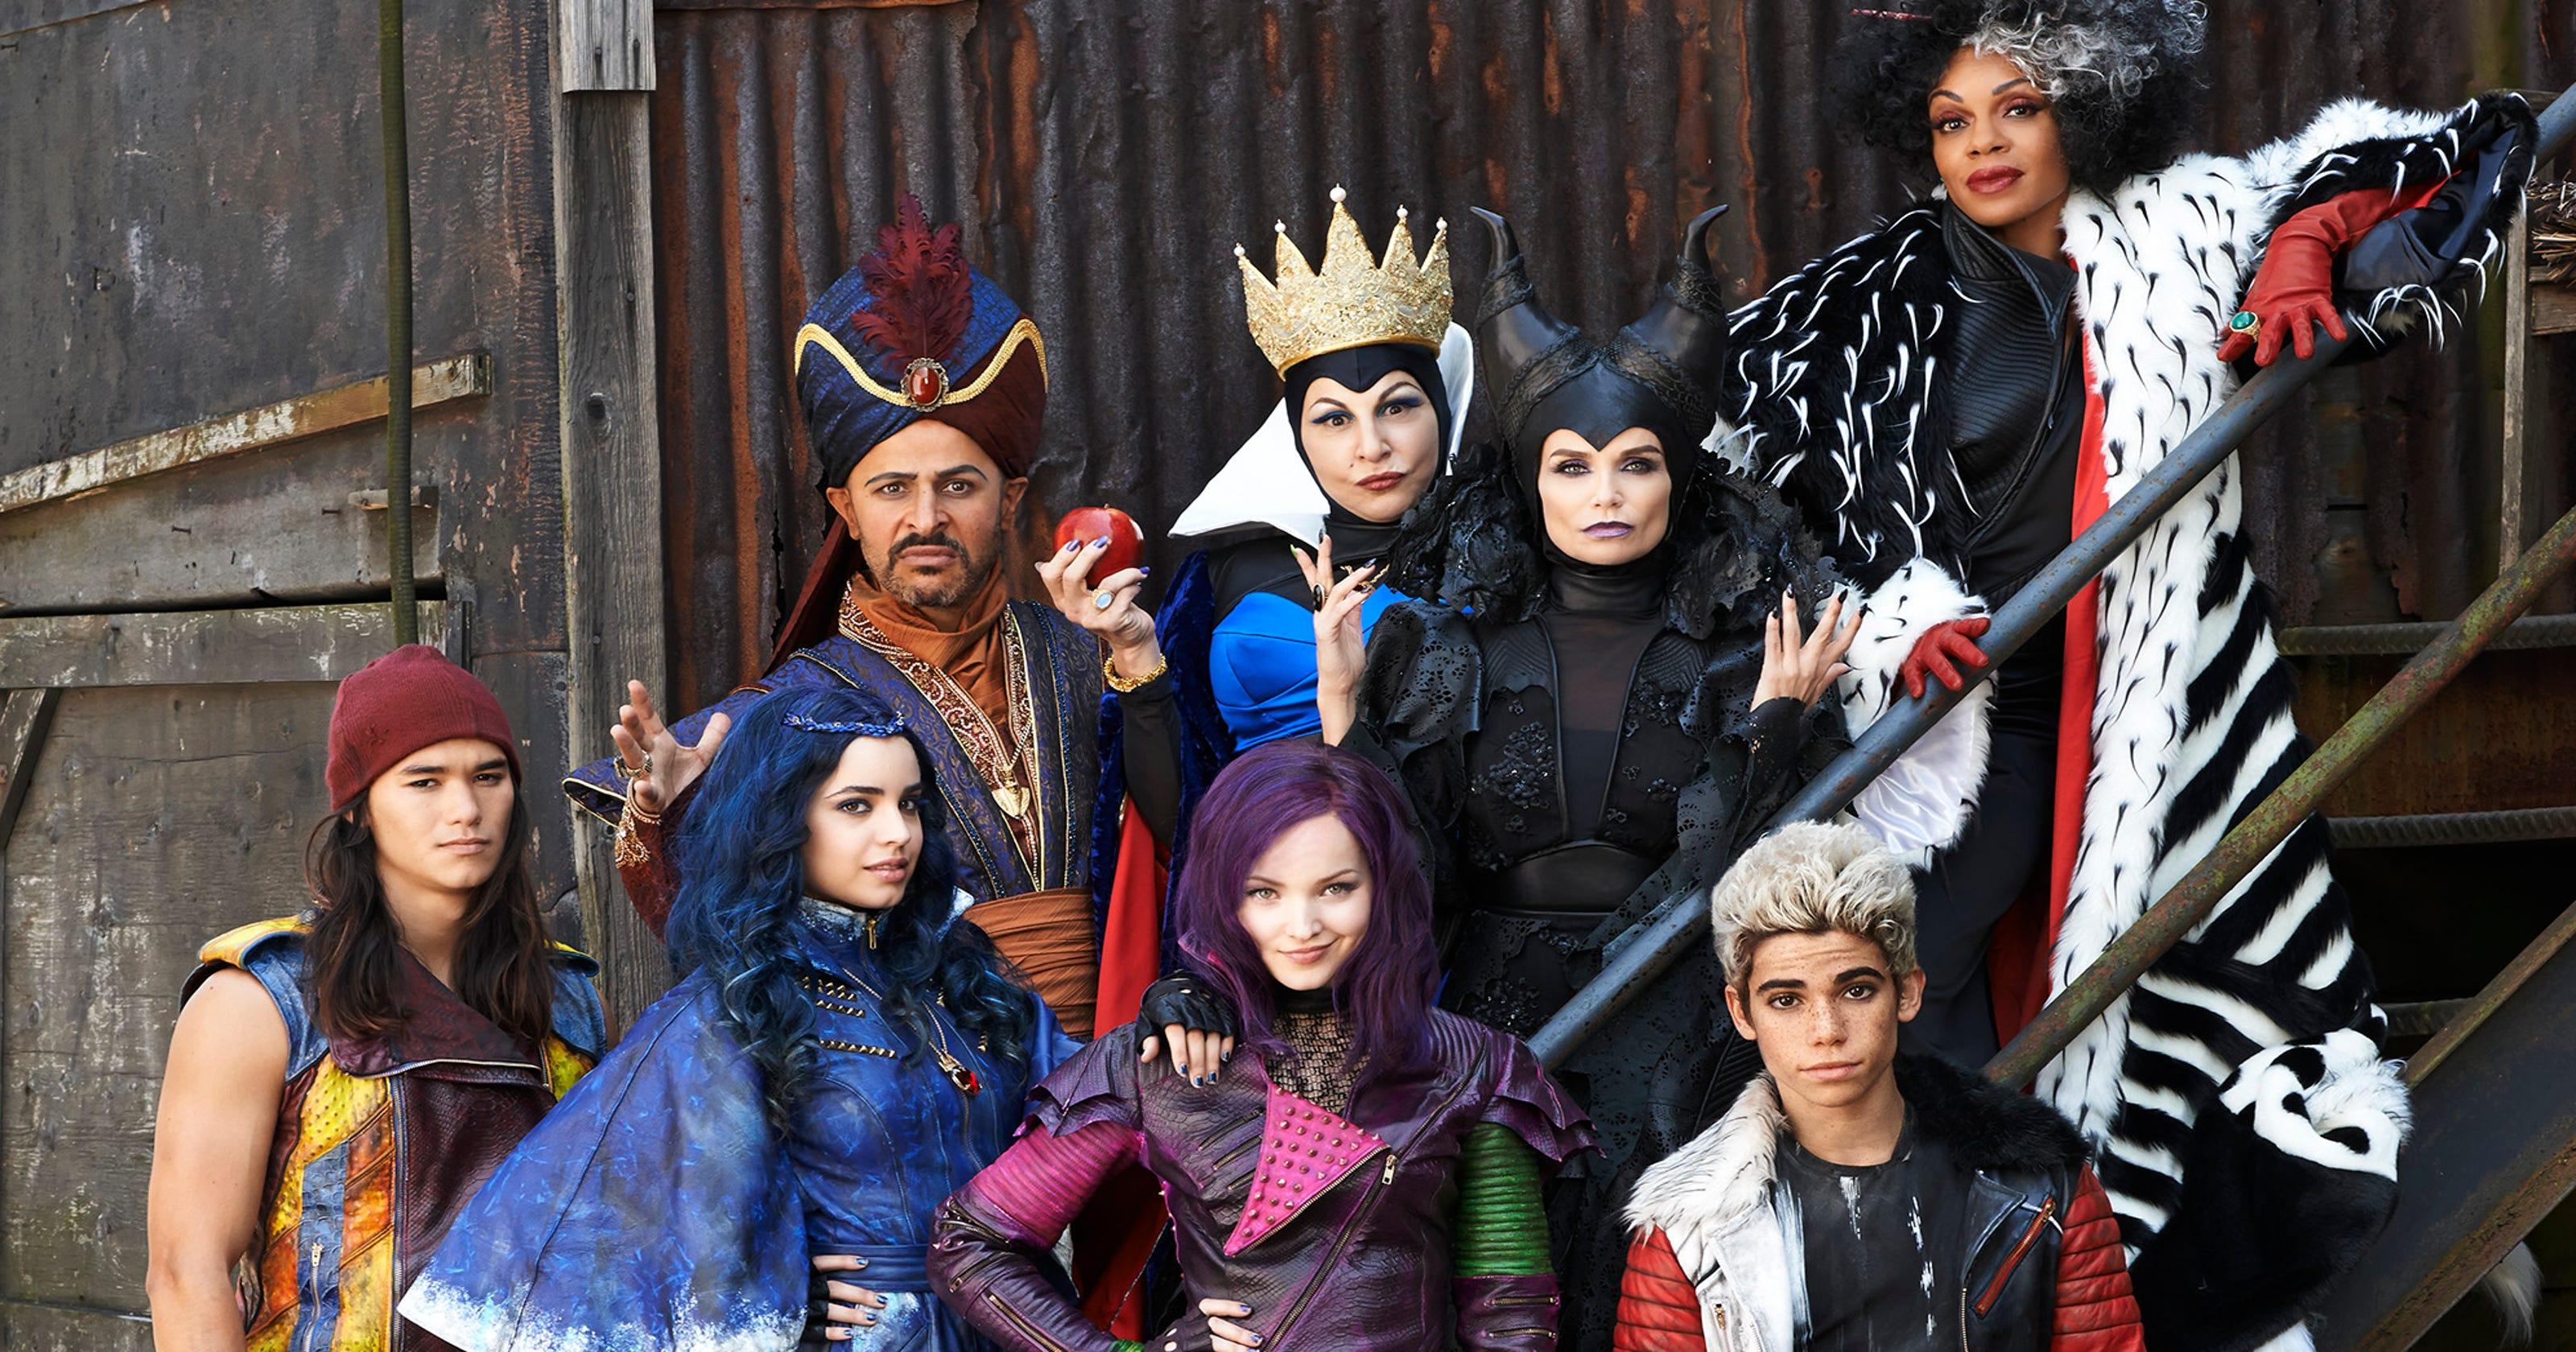 Descendants 3 Is Coming In 2019 Disney Channel Announces